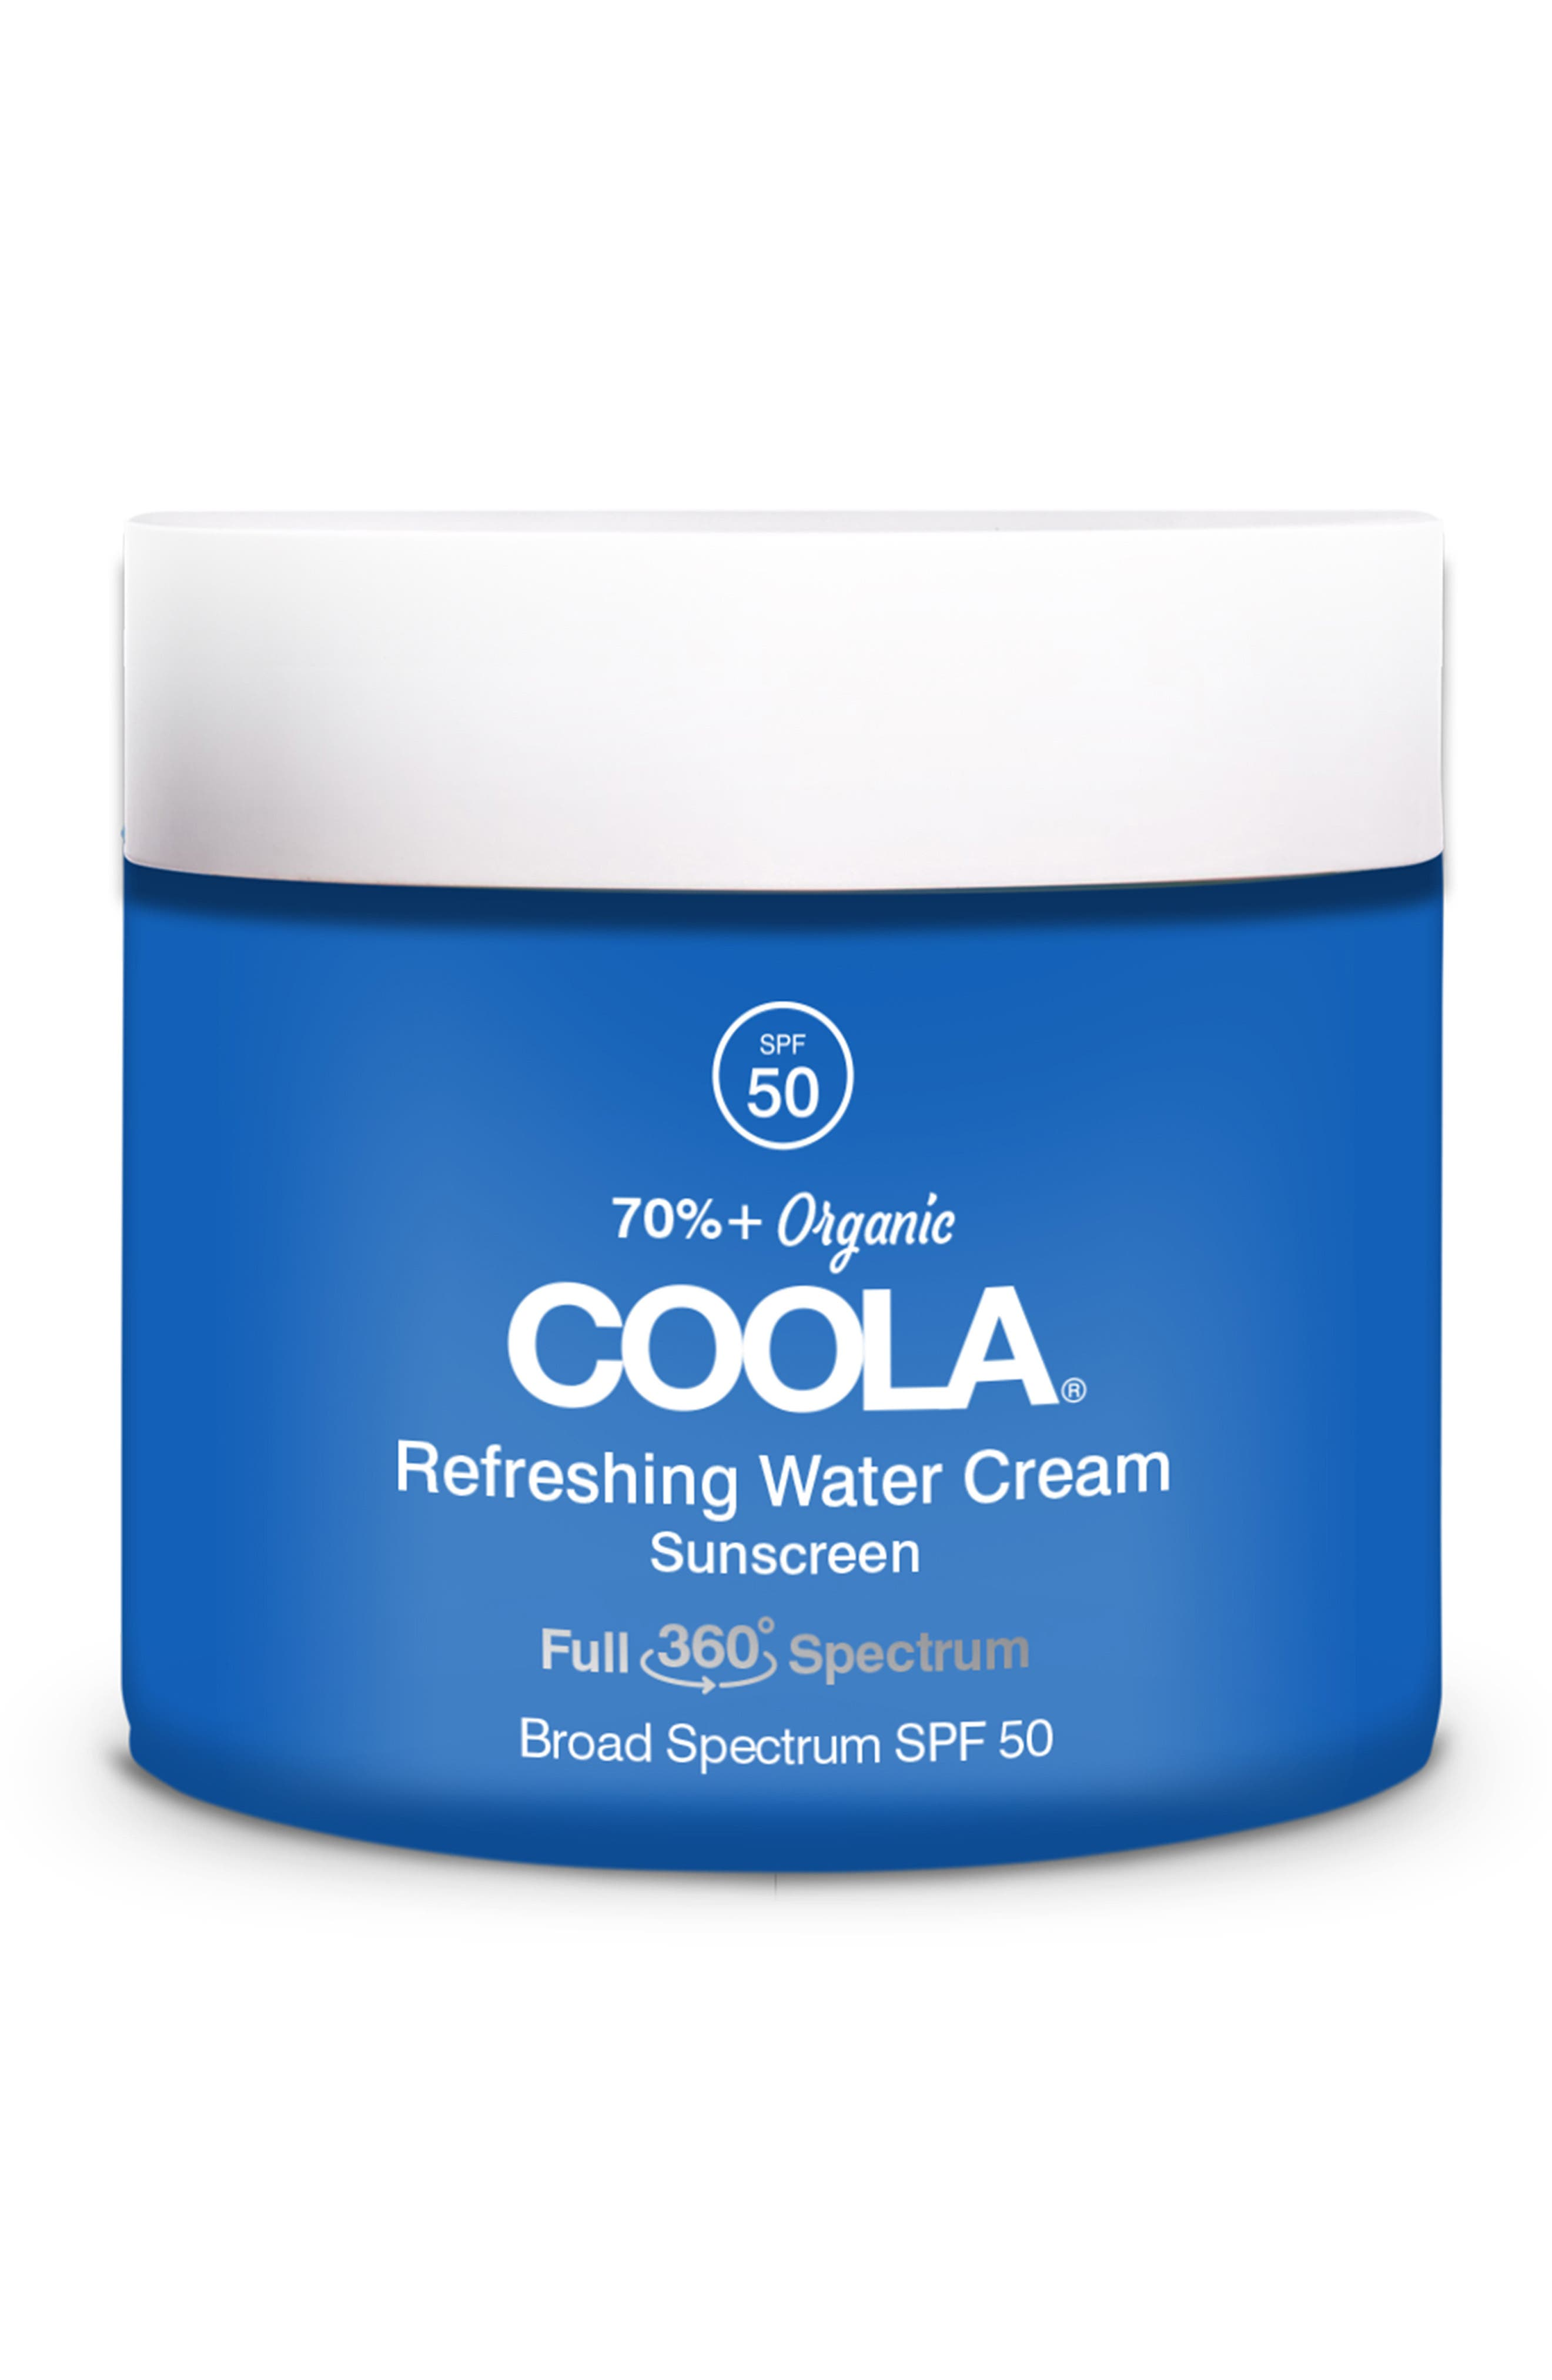 Coola Refreshing Water Cream Broad Spectrum Spf 50 Sunscreen